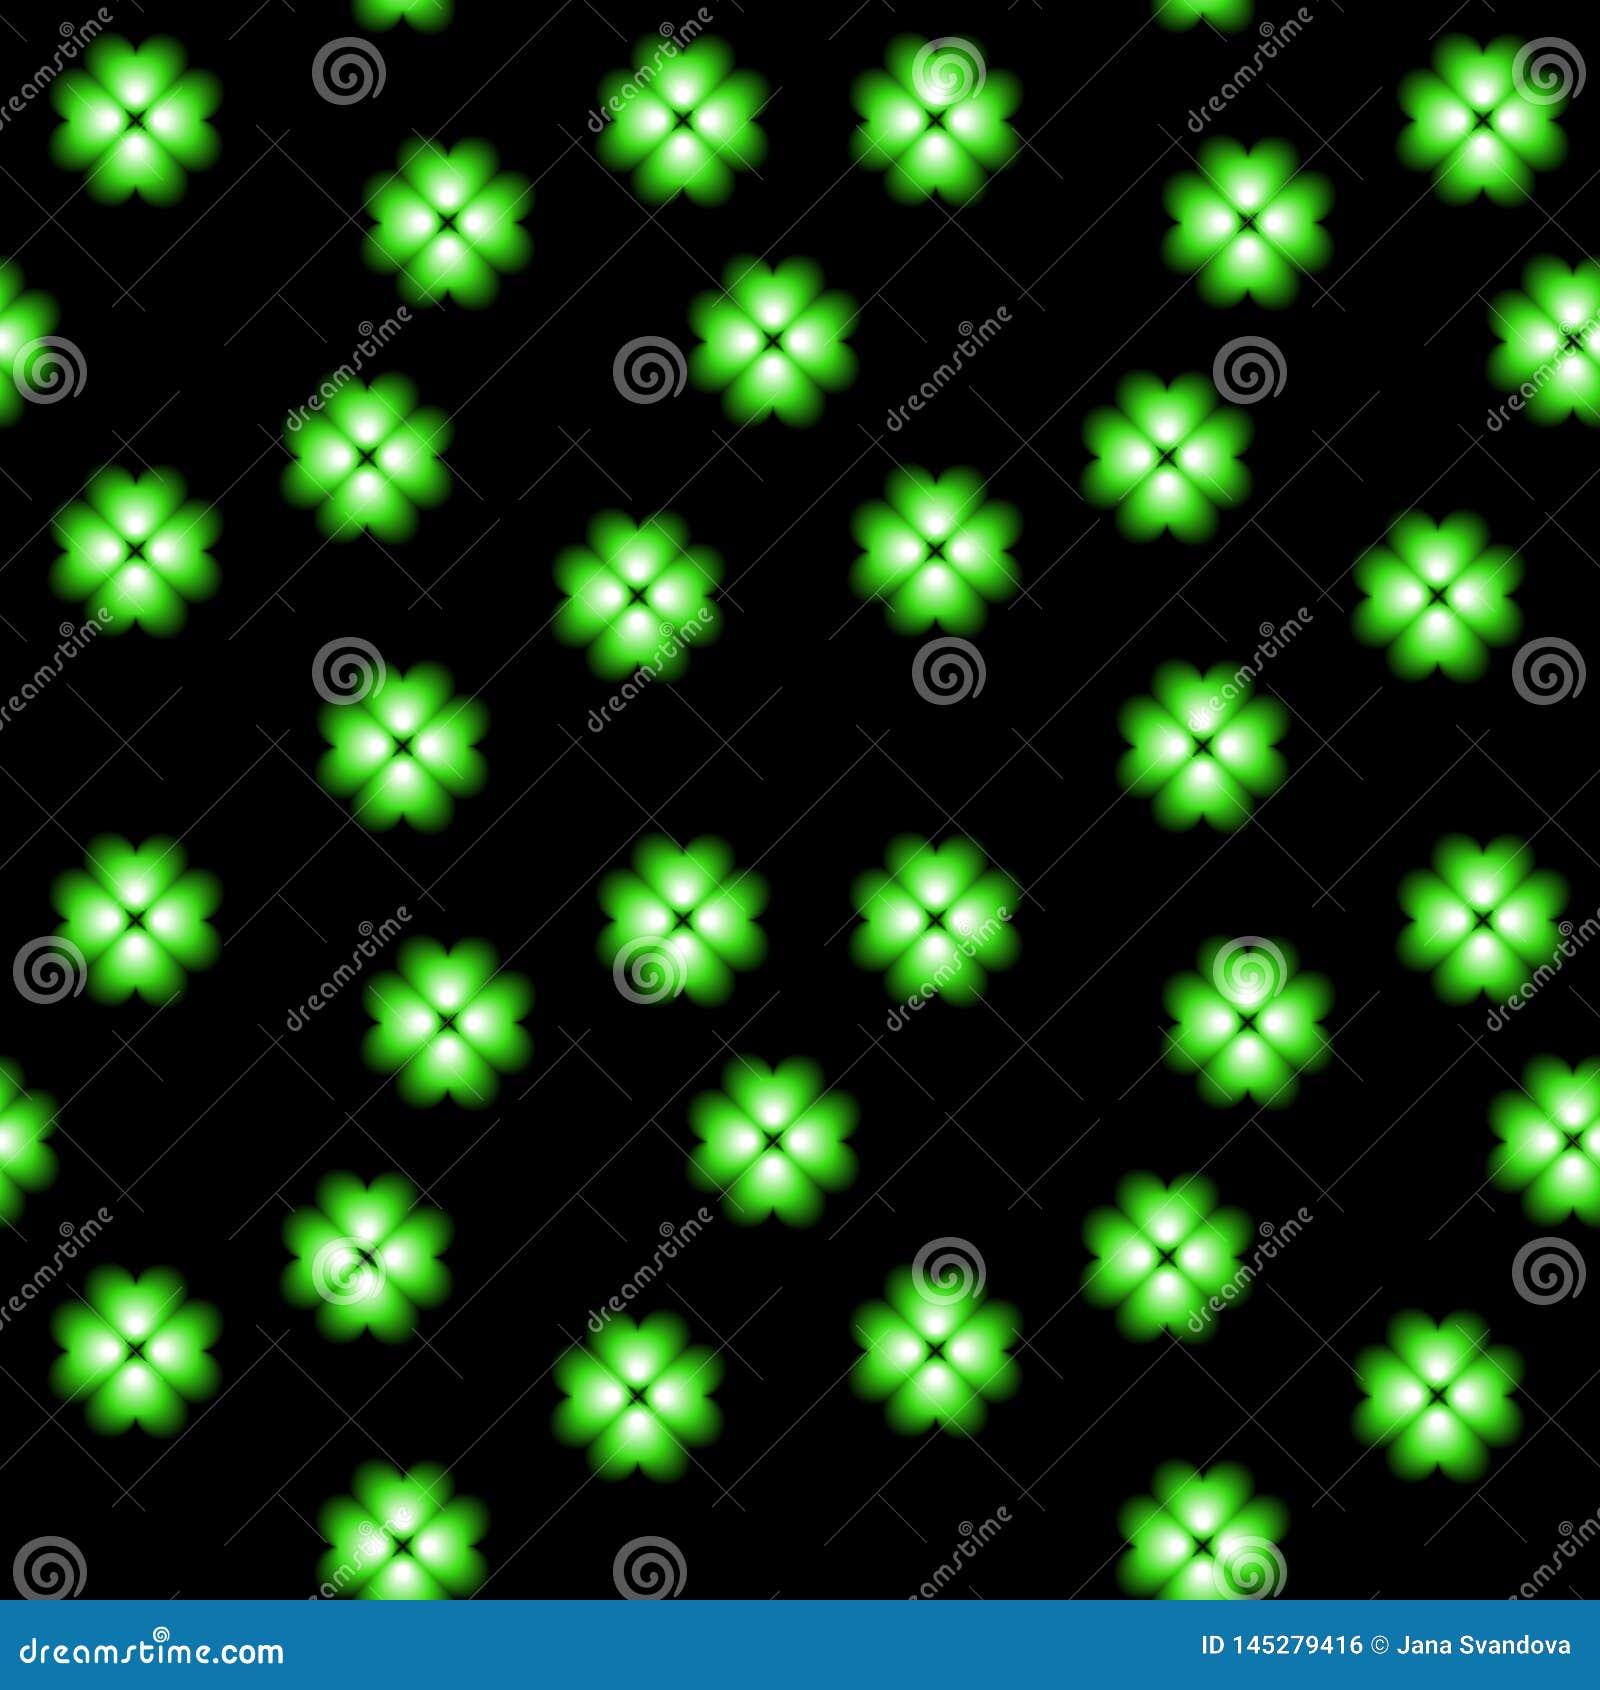 Trébol de neón verde, símbolo de la suerte, fondo inconsútil del vector floral